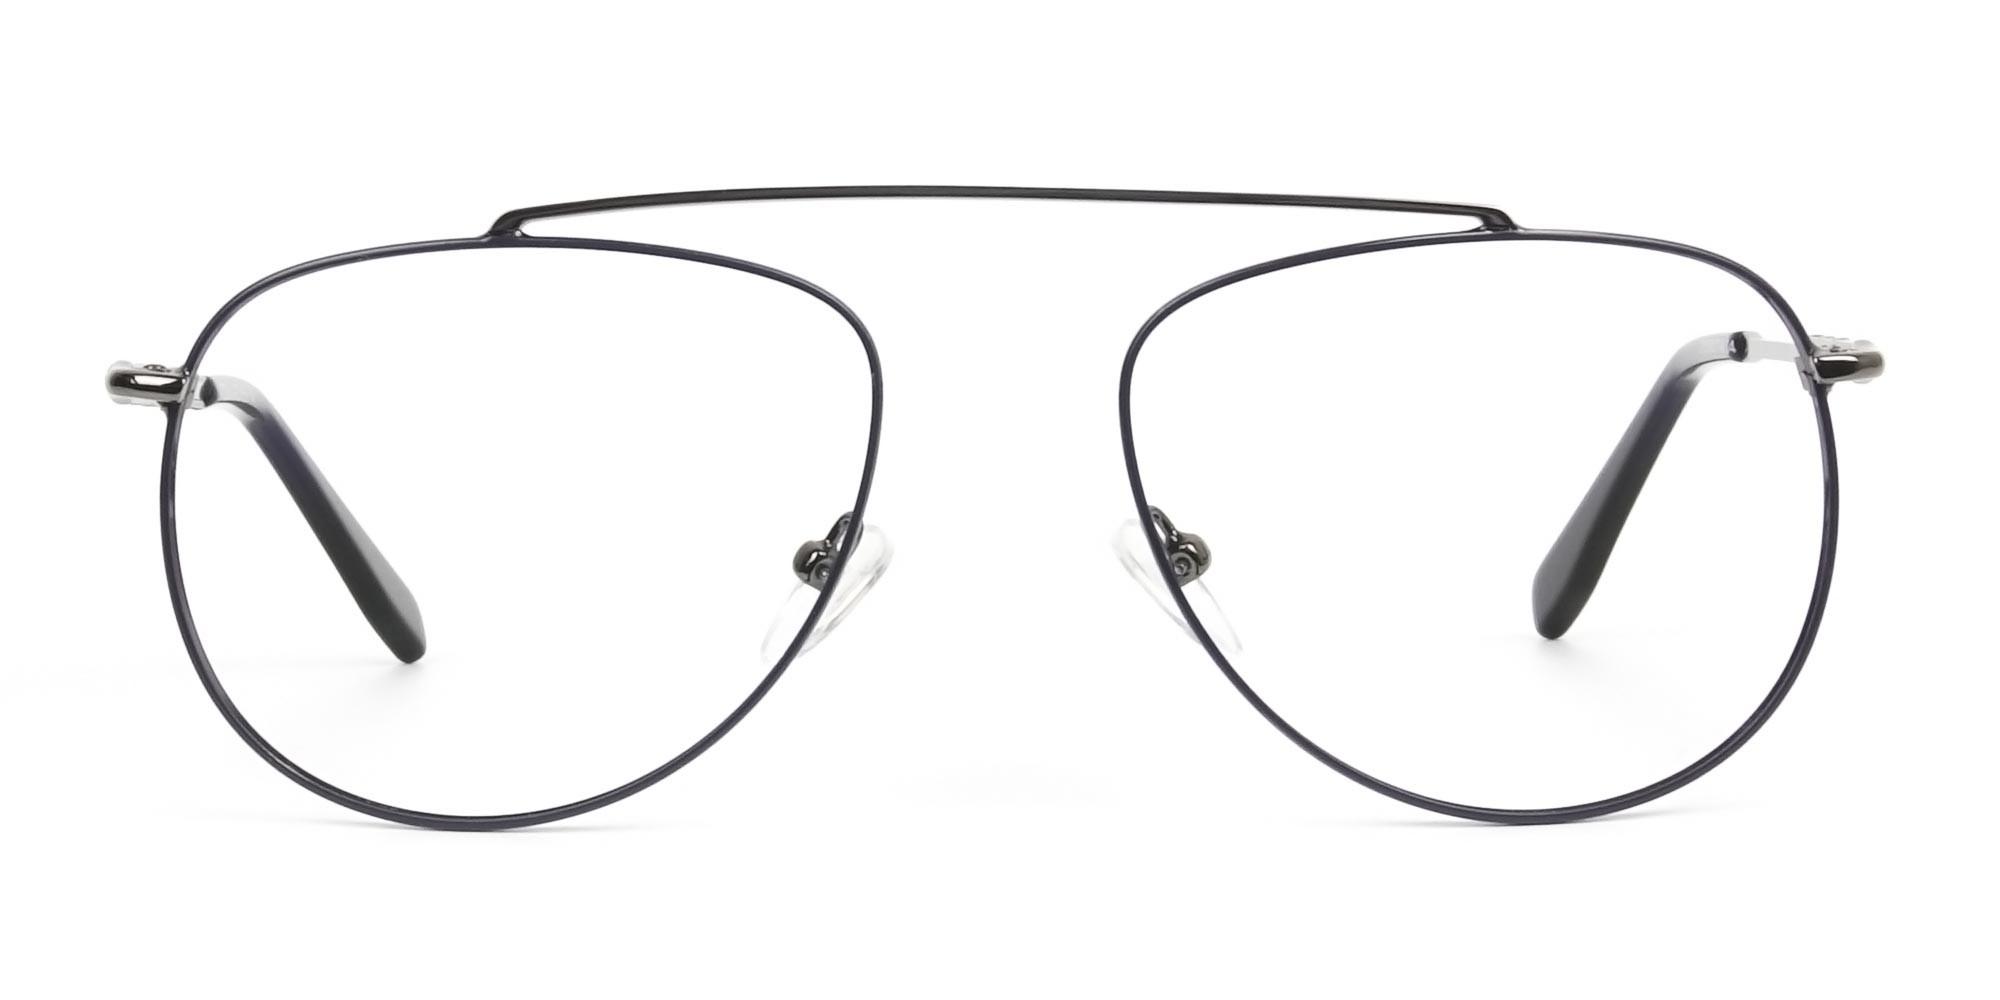 Gunmetal & Dark Navy Thin Metal Aviator Glasses - 1